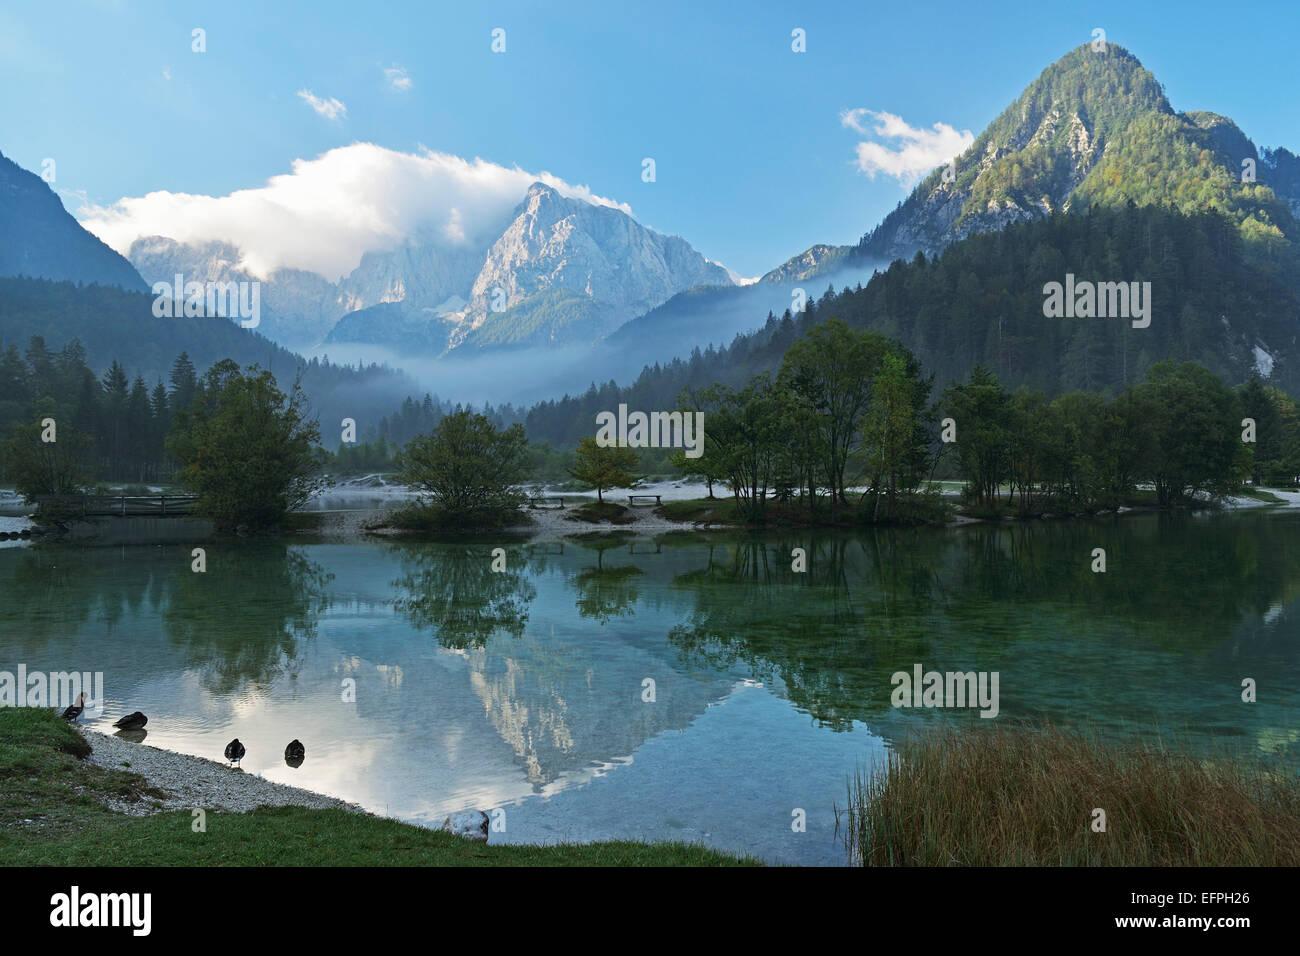 Lake Jasna and Julian Alps, Kranjska Gora, Slovenia, Europe - Stock Image